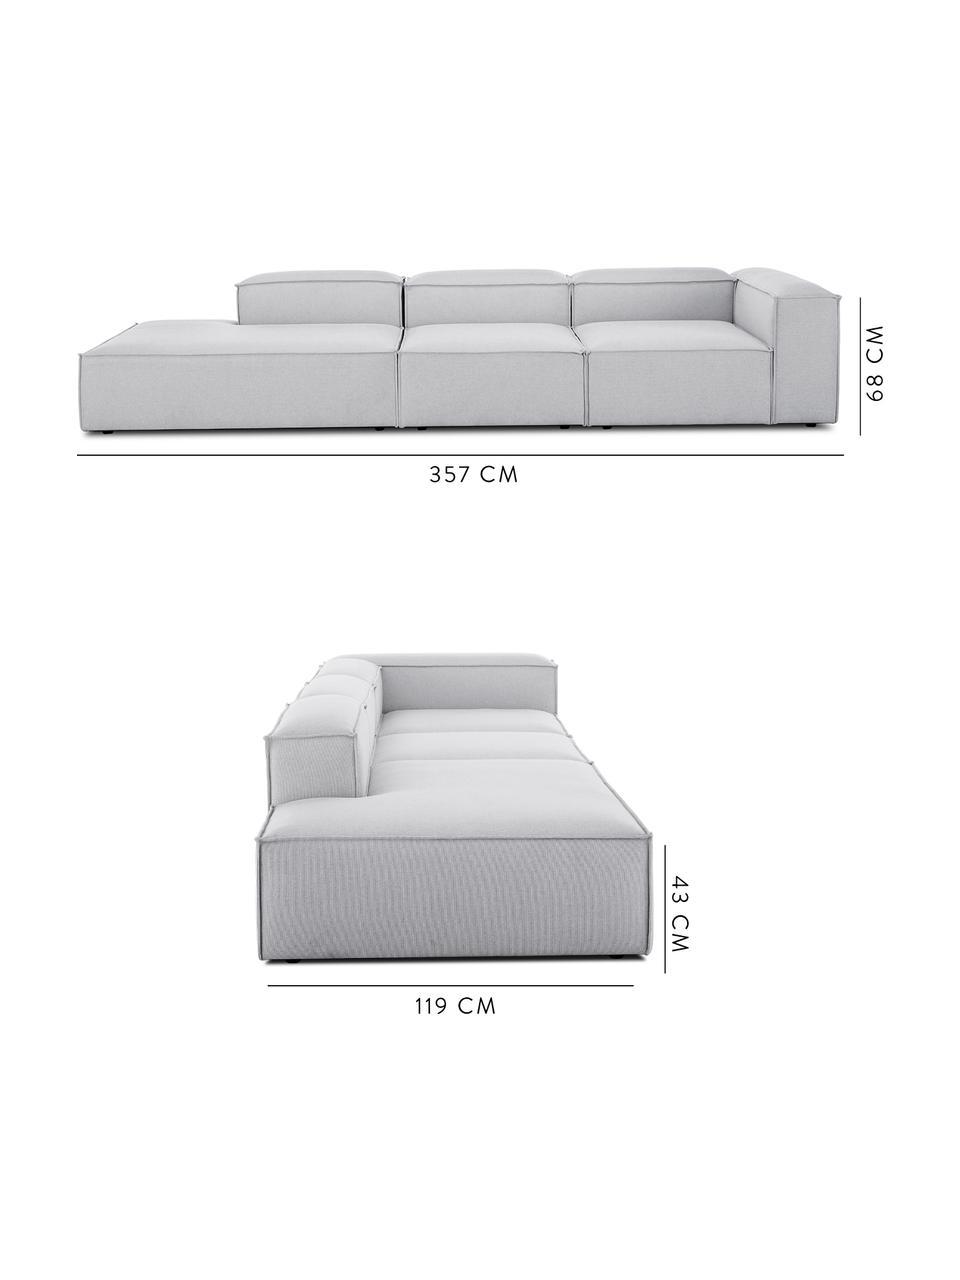 Canapé modulable XL dossier bas Lennon, Tissu gris clair